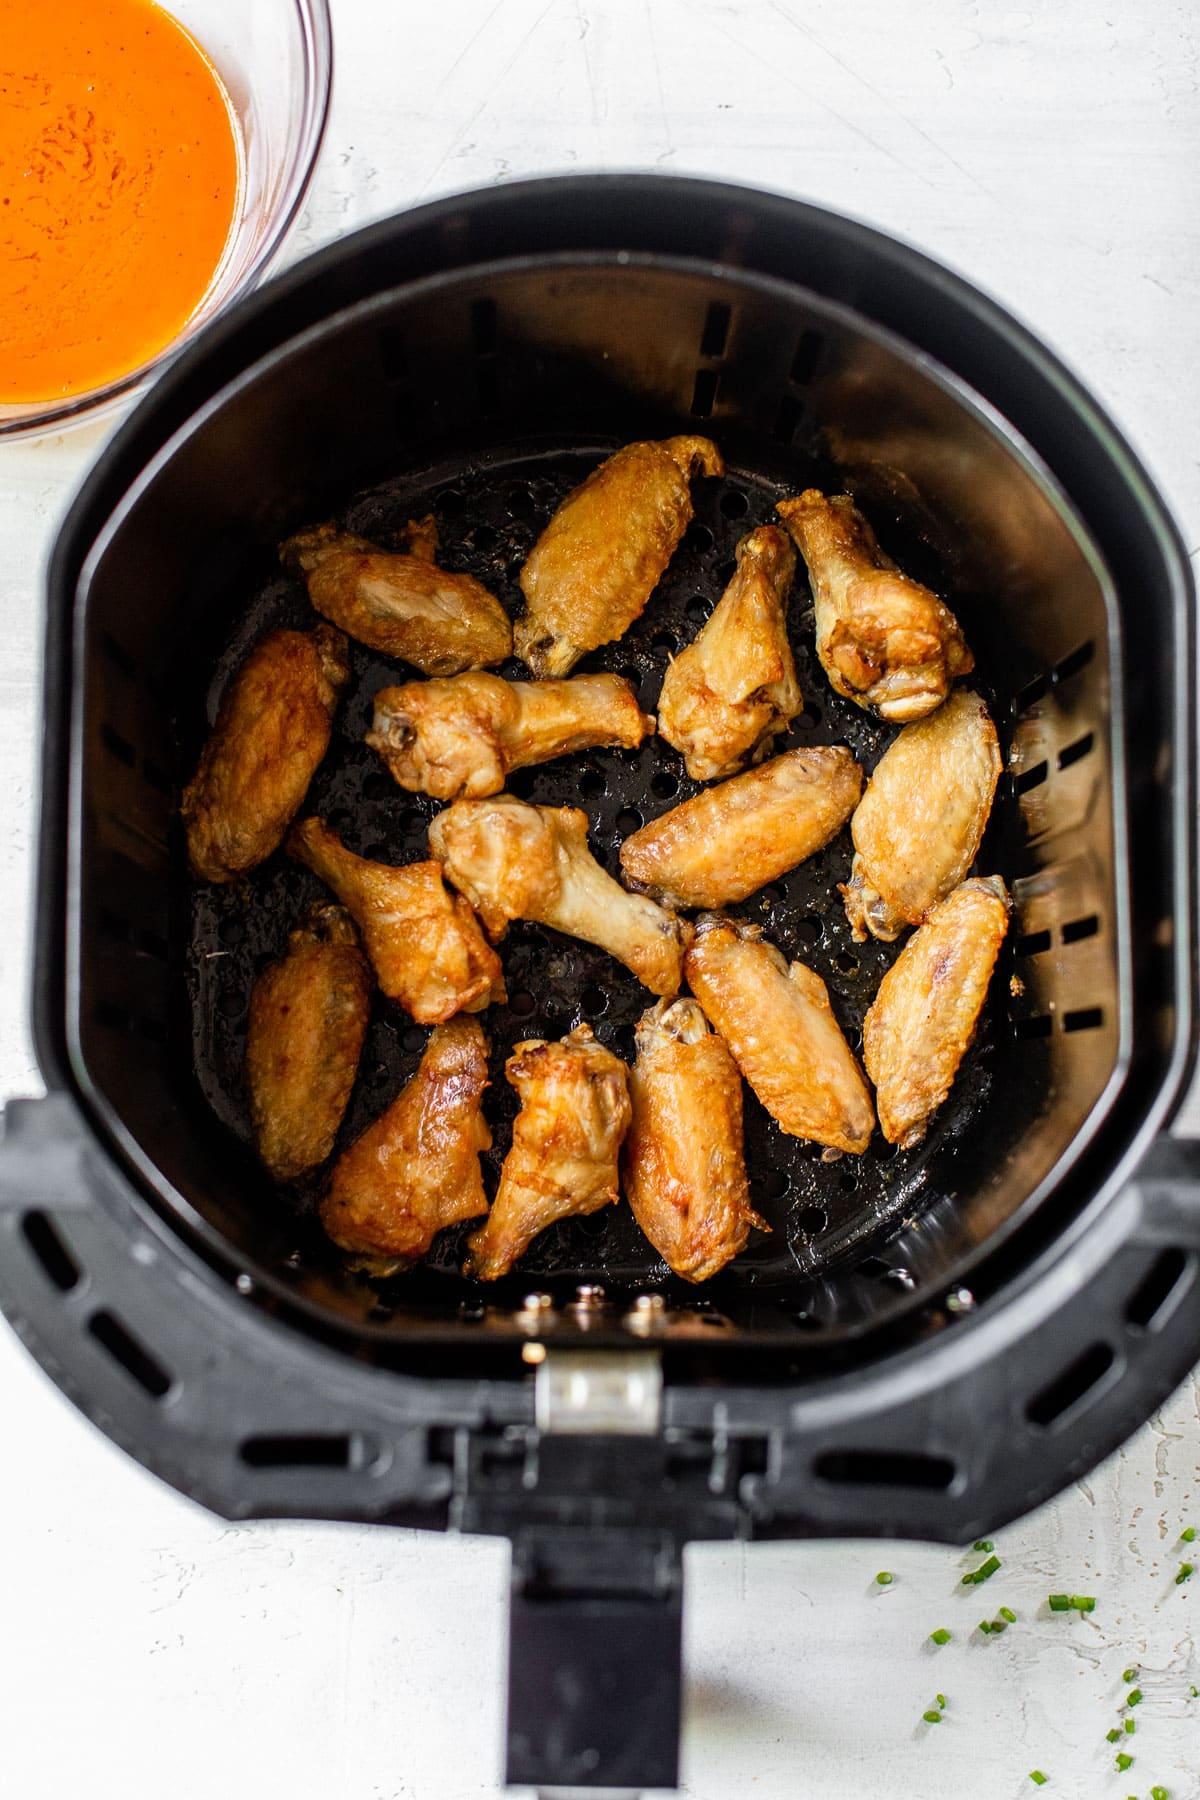 split chicken wings in air fryer basket